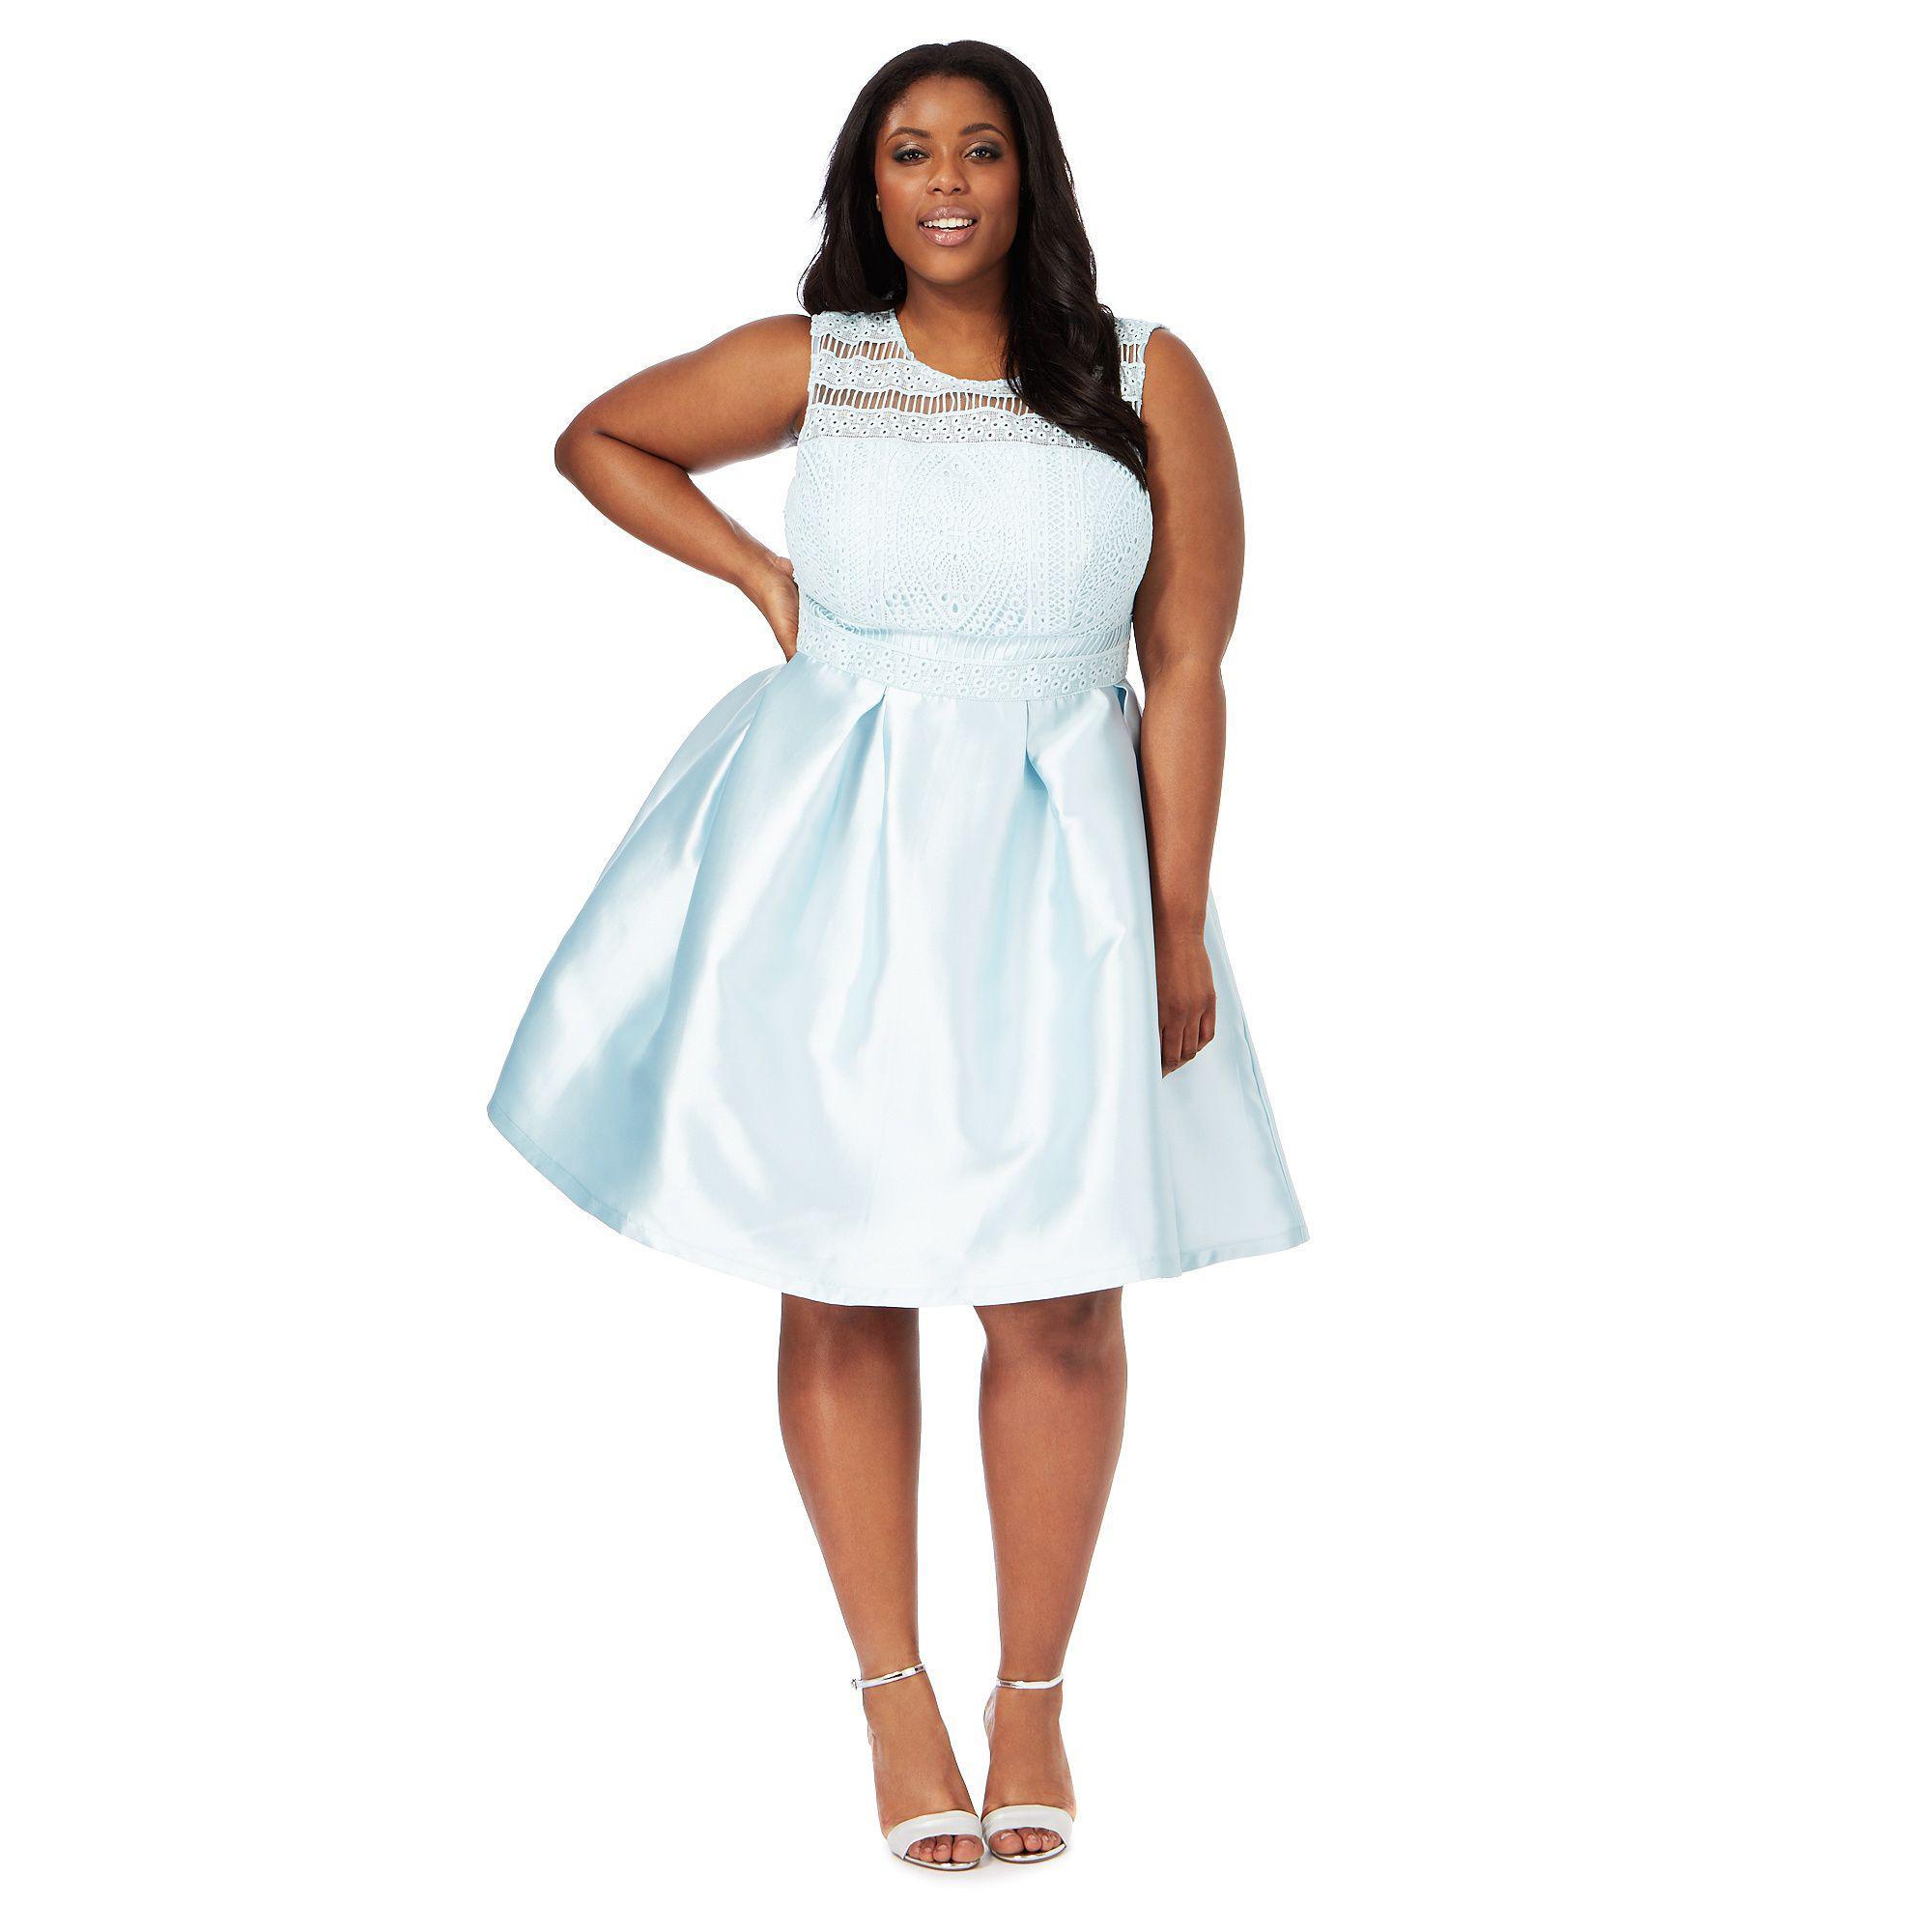 7278b64aa6f Light Blue Plus Size Cocktail Dress - raveitsafe